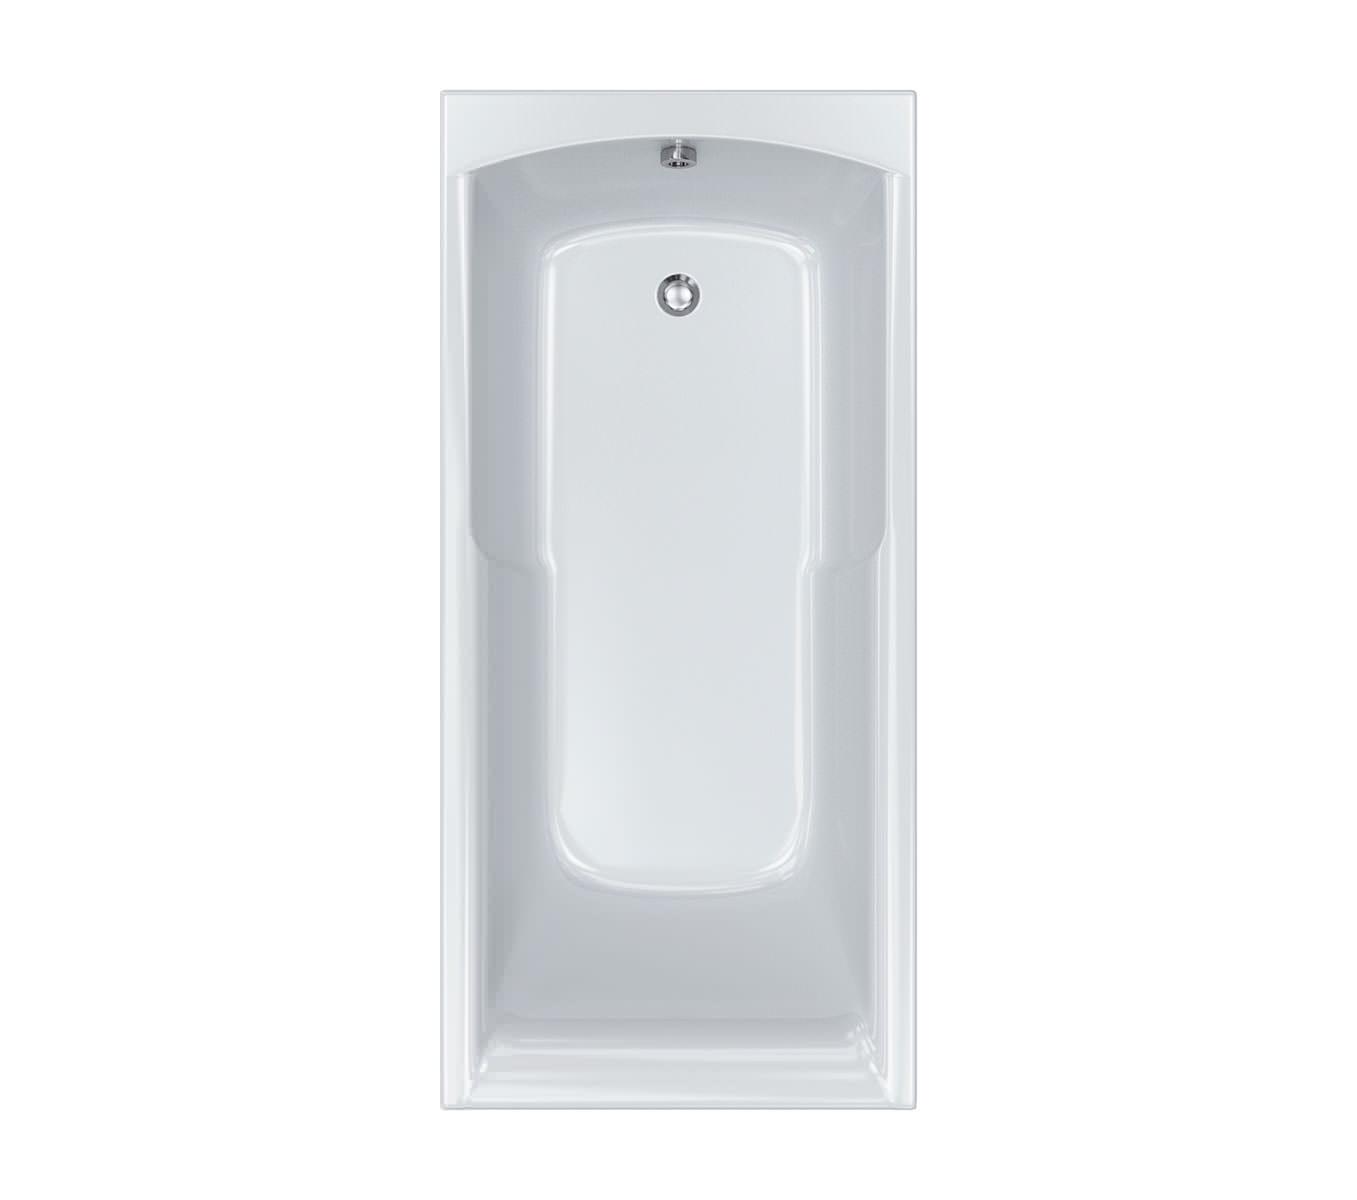 carron apex shower bath 1700 x 800mm cabap17080pa q4 02011 carron sigma right hand shower bath 1800 x 900mm